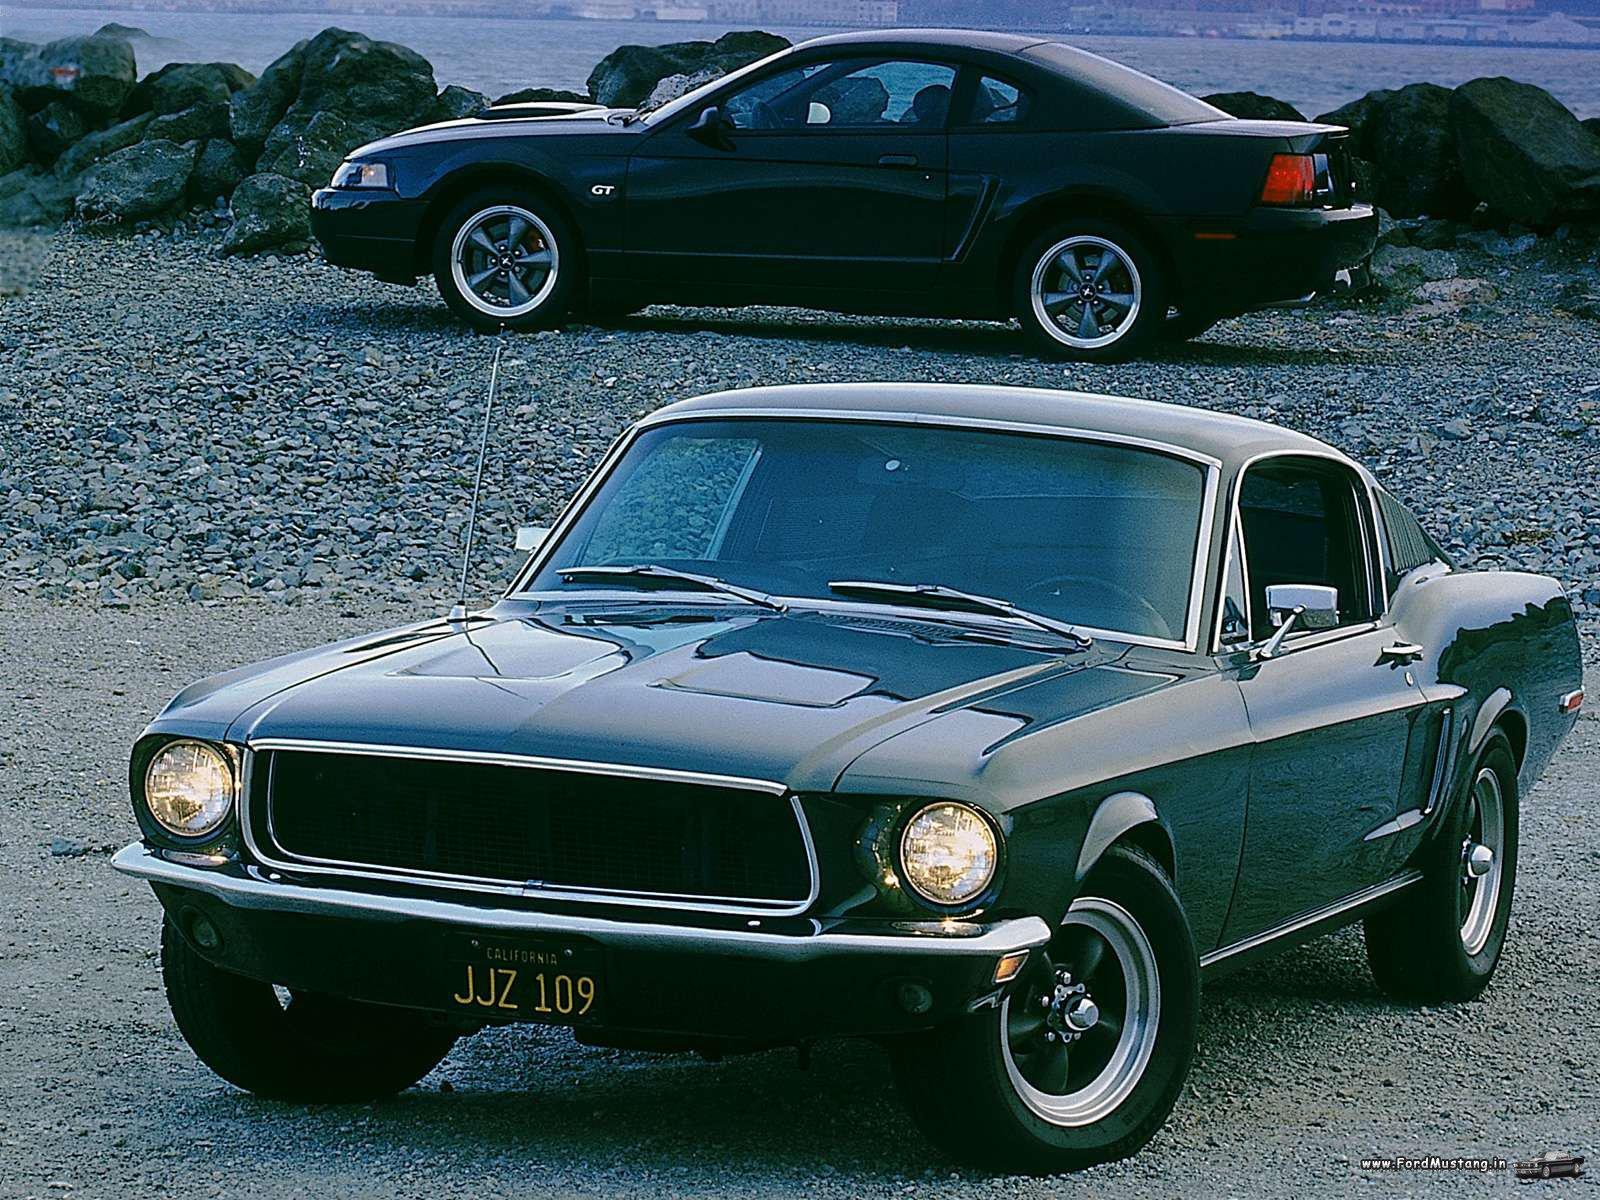 2018 Mustang Boss 429 >> Ford Mustang Bullitt Fastback 1968 1600×1200 wallpapers HD | Ford Mustang, Ford Mustang Bullitt ...